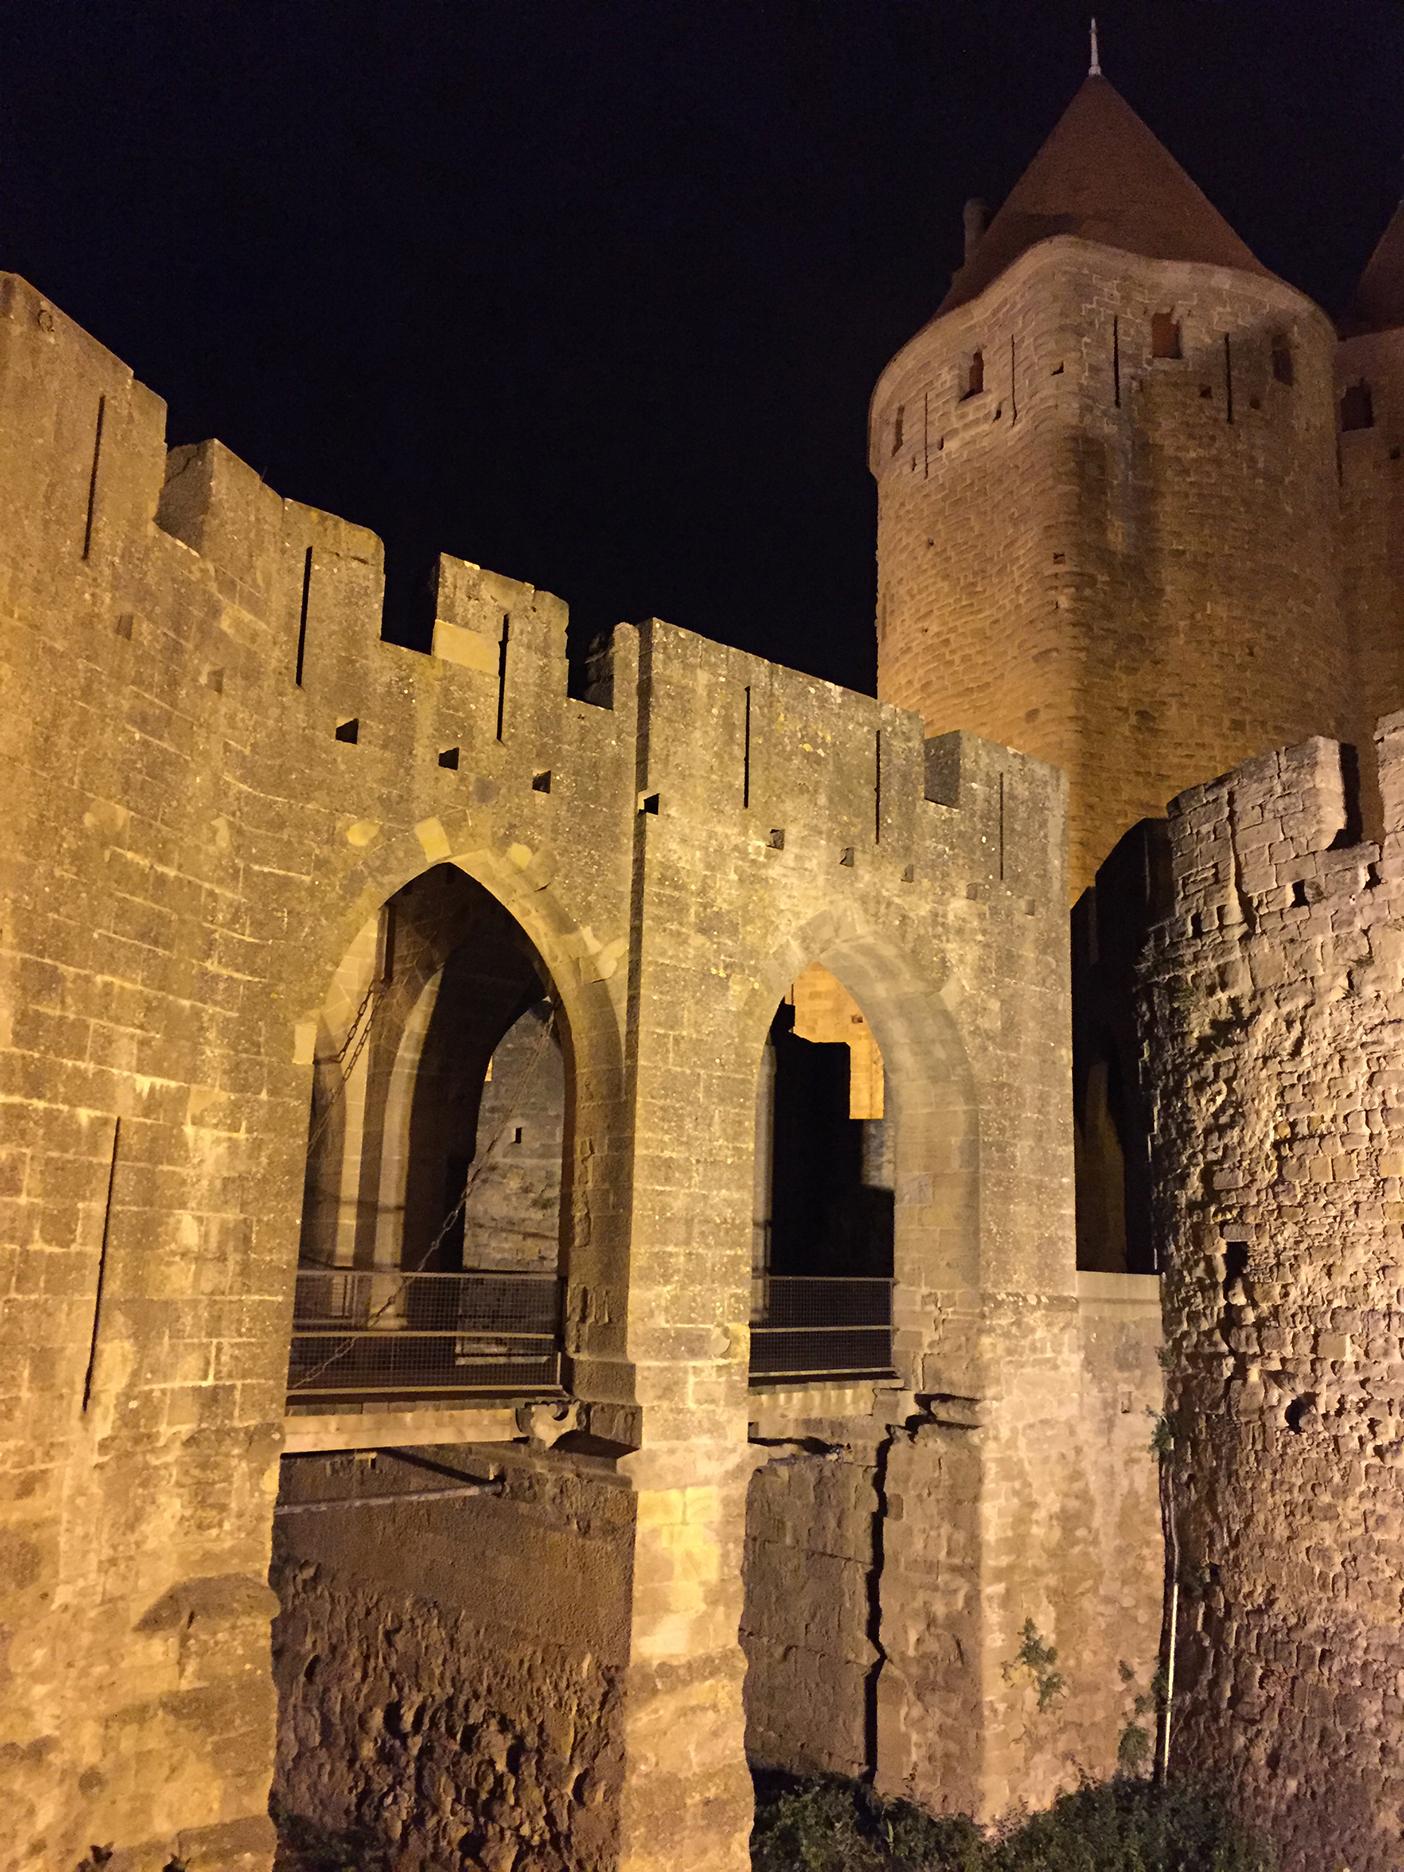 Porte Narbonnaise, the main entrance